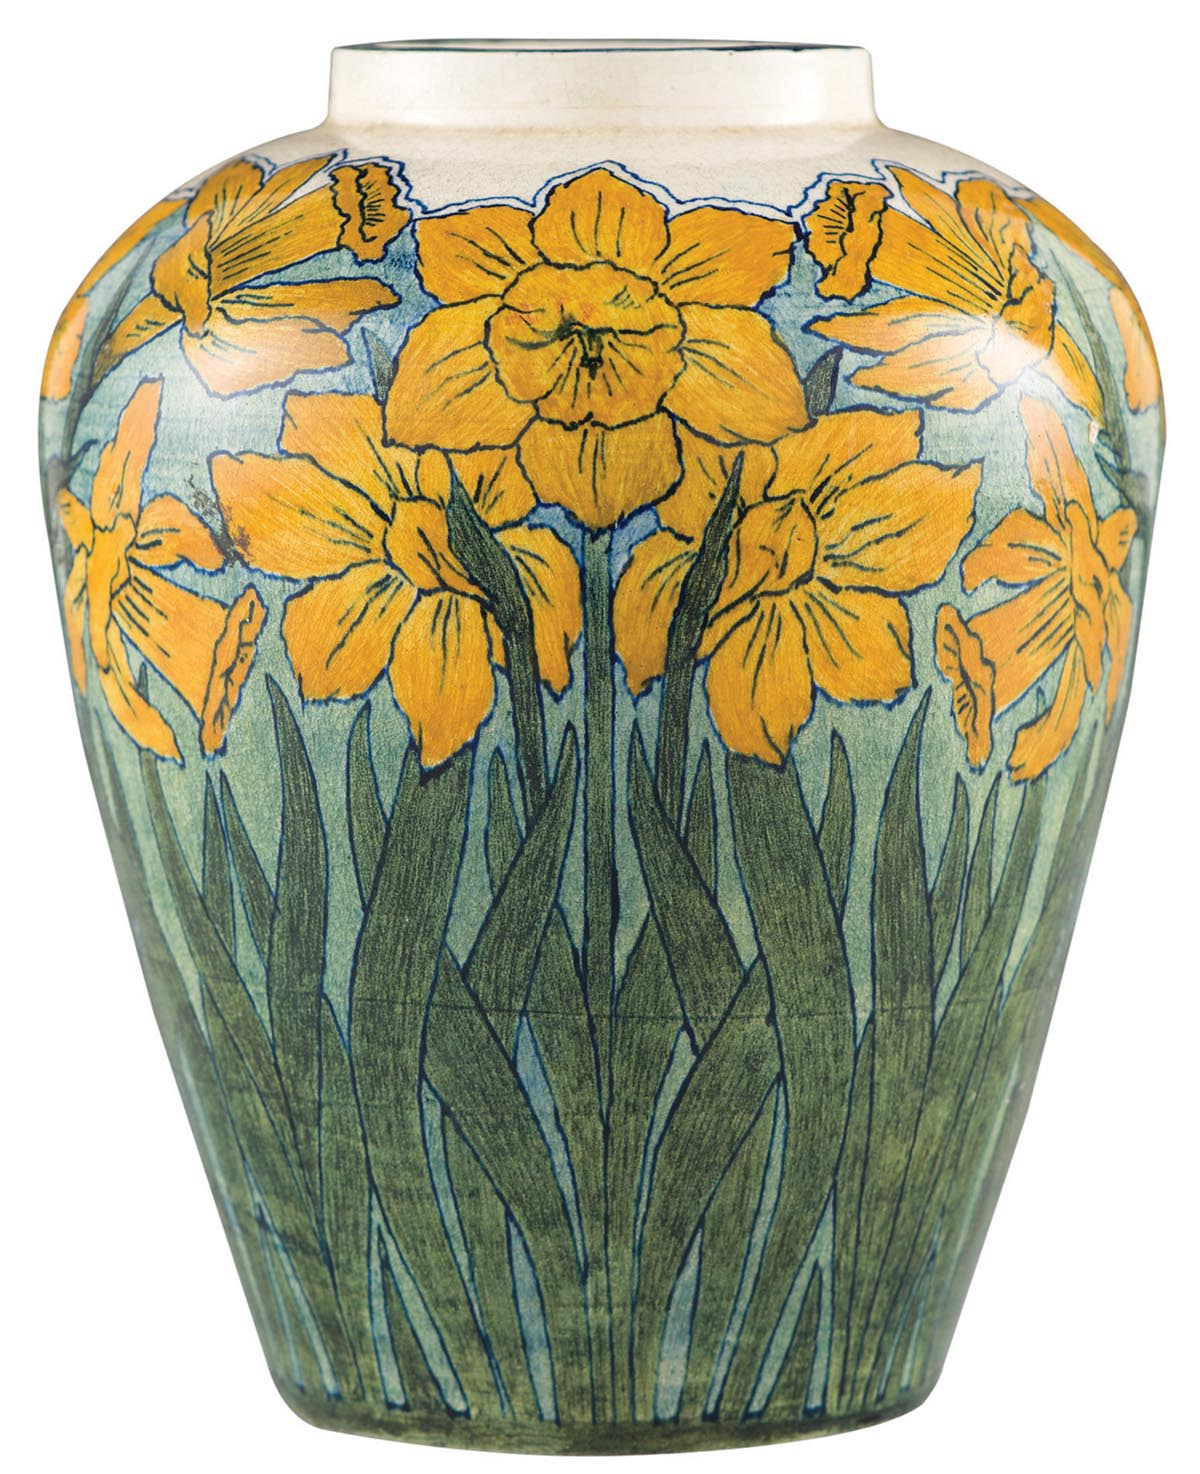 Newcomb_Vase_Daffodil_1897